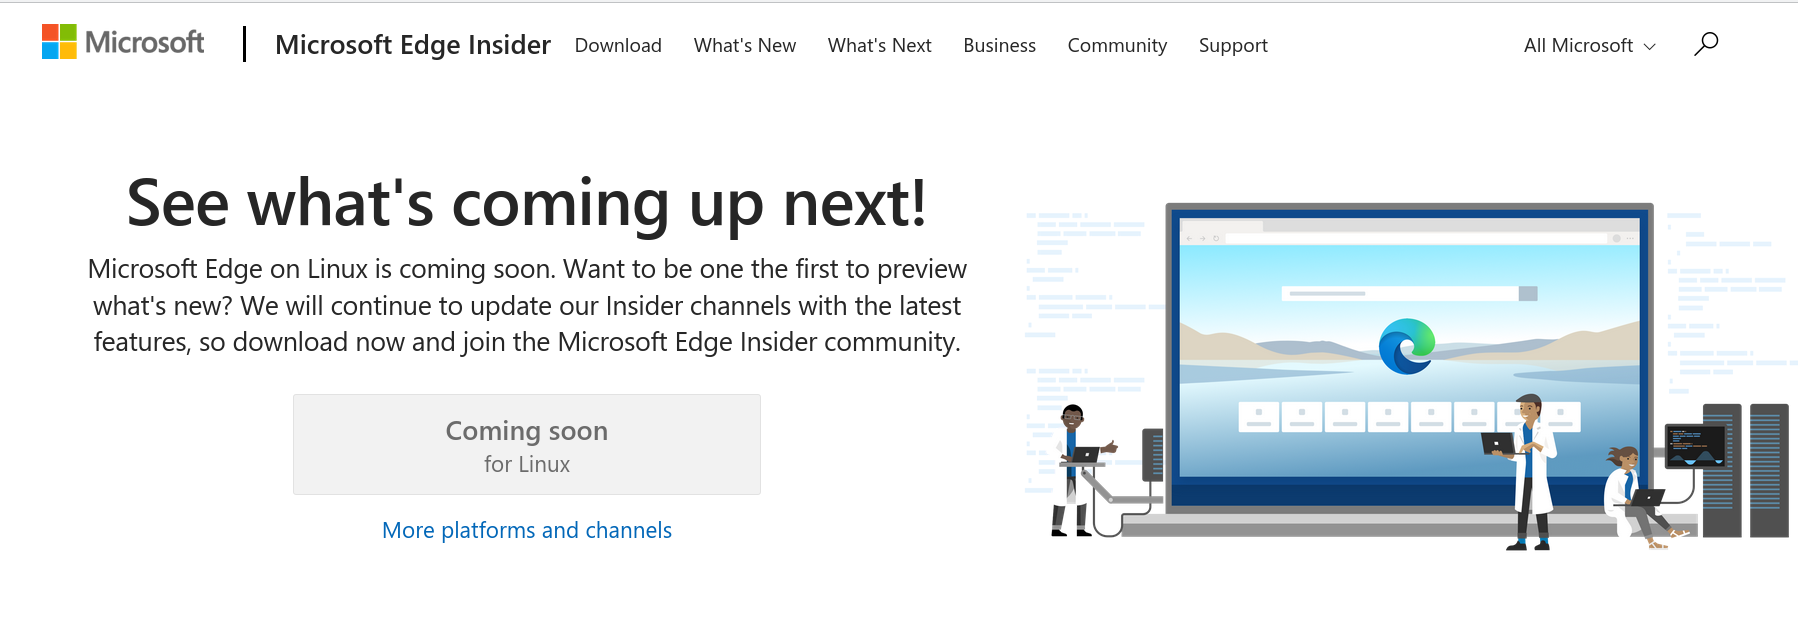 Screenshot 2020 09 23 07 34 03 - Microsoft Edge για Linux από τον επόμενο μήνα